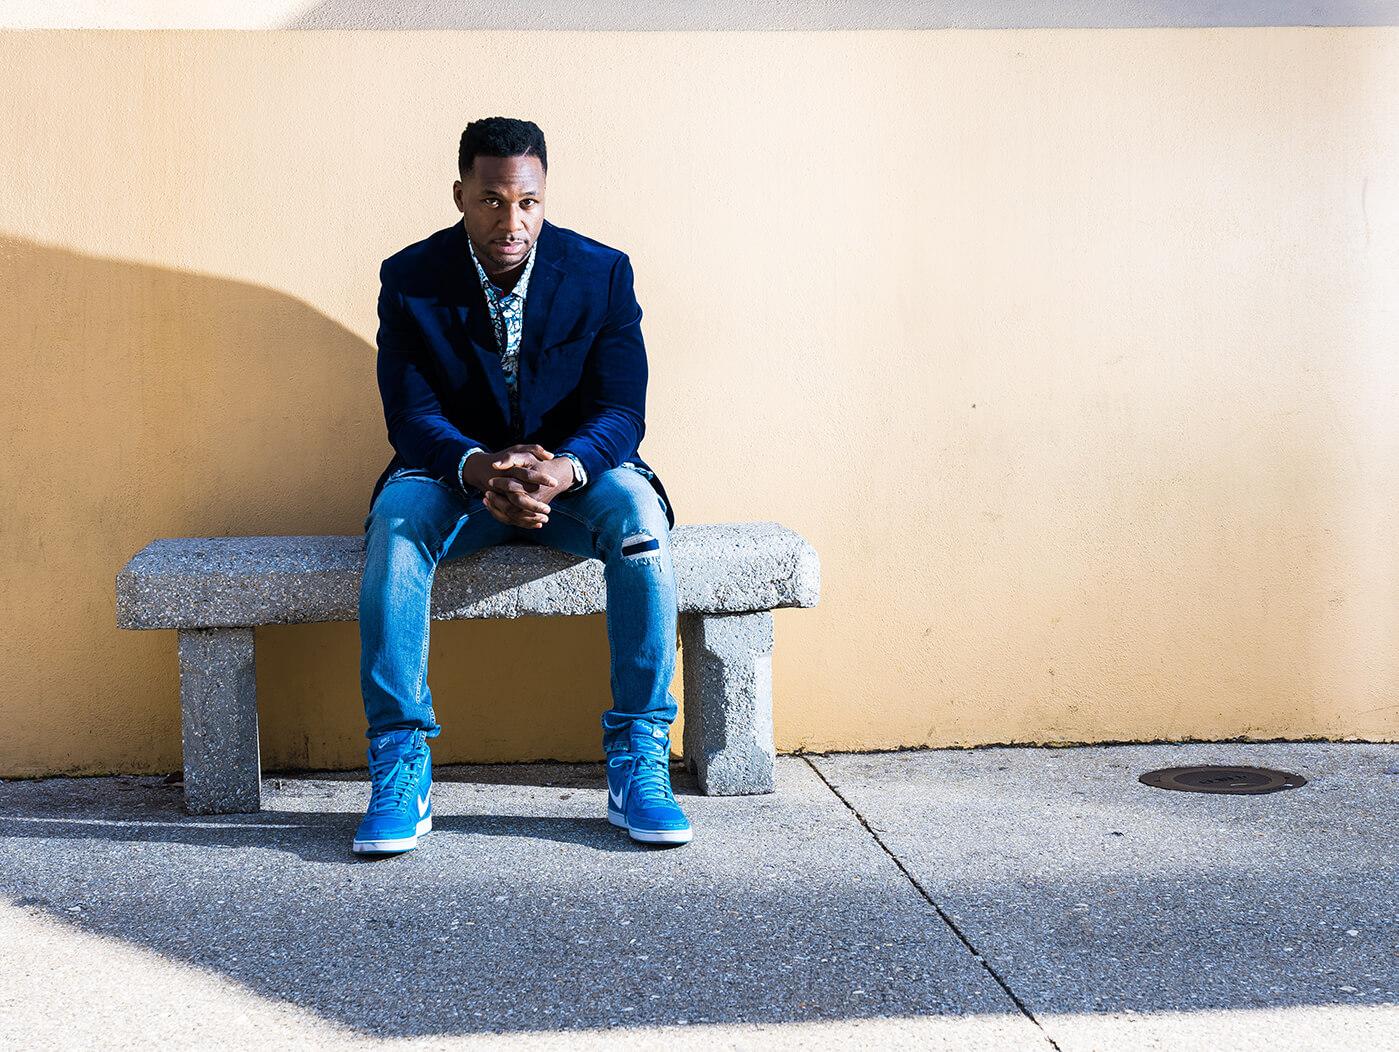 Robert Randolph sitting on bench